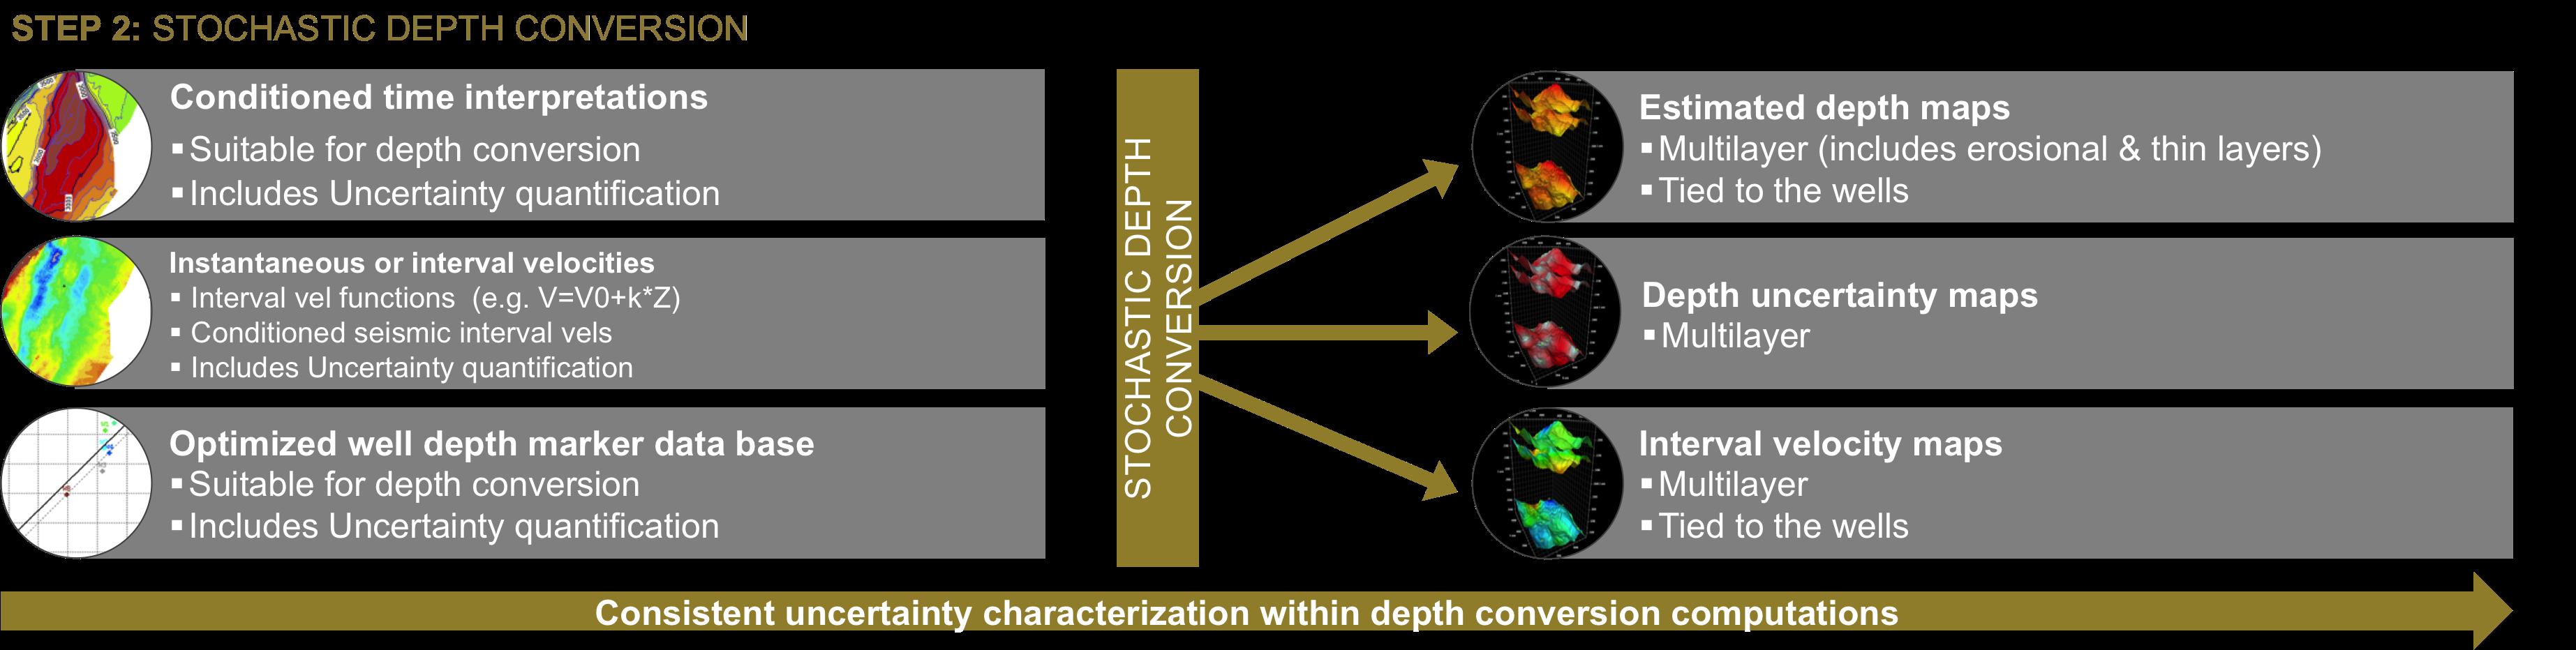 Step 2: Stochastic Depth Conversion